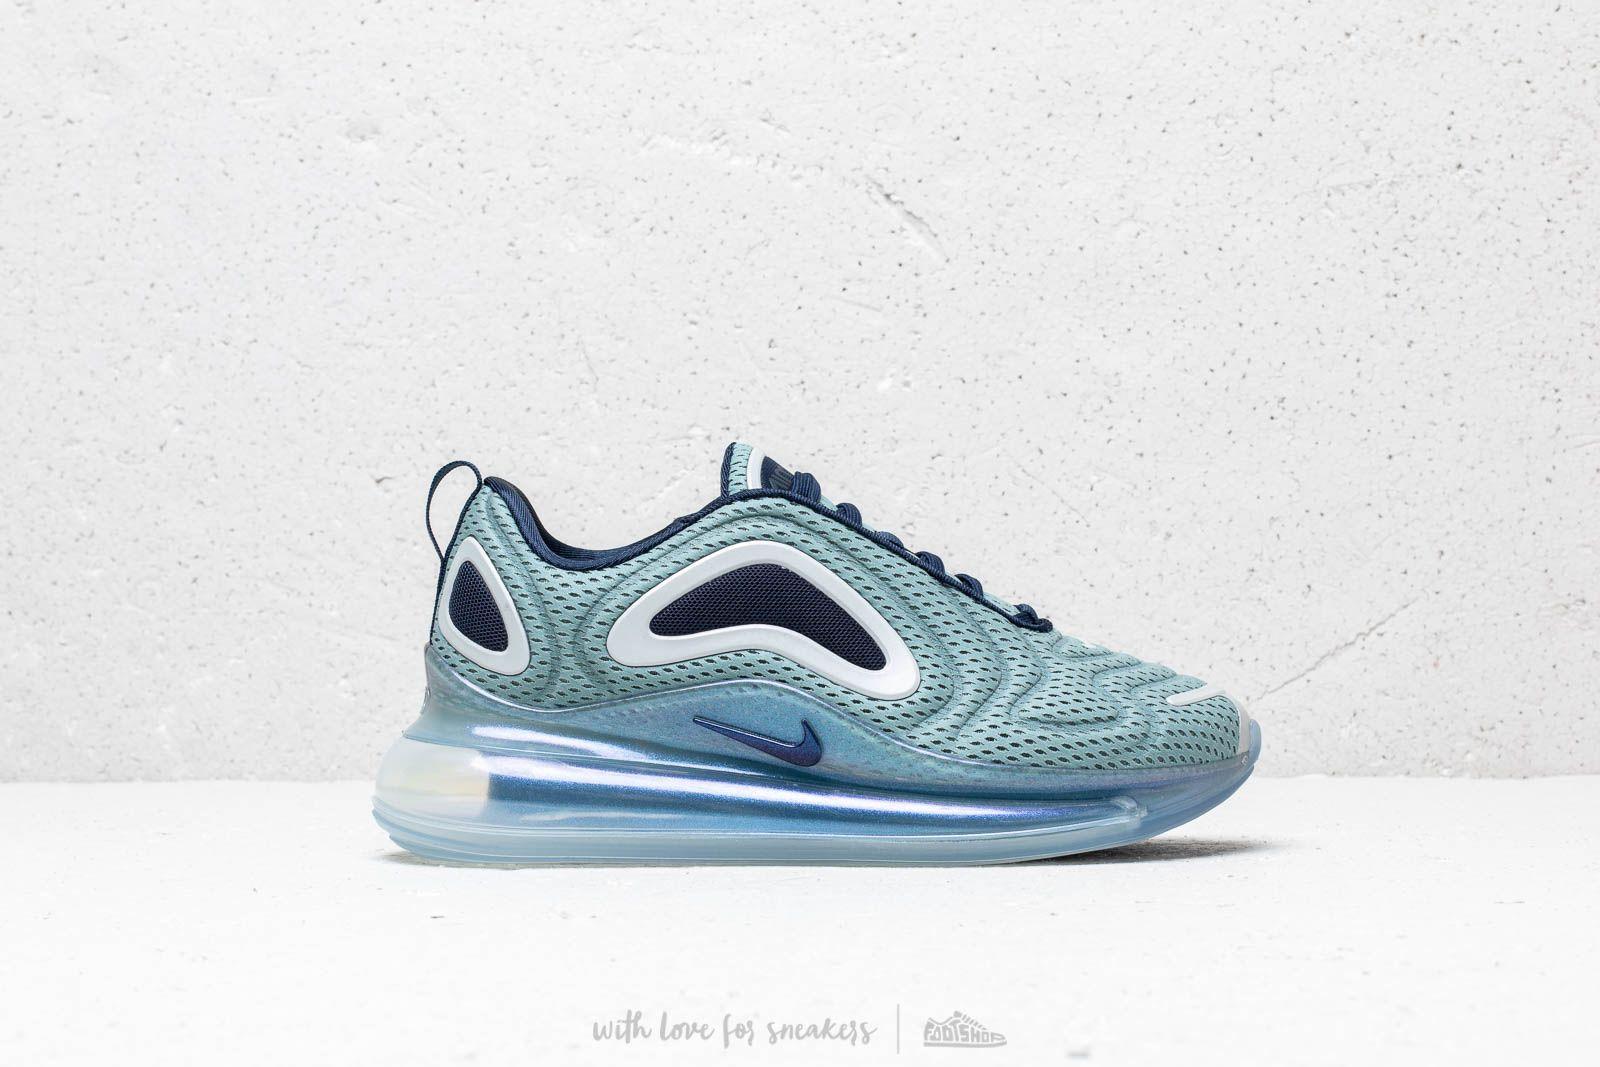 Lyst - Nike W Air Max 720 Metallic Silver  Midnight Navy in Blue 4c1eb51df1